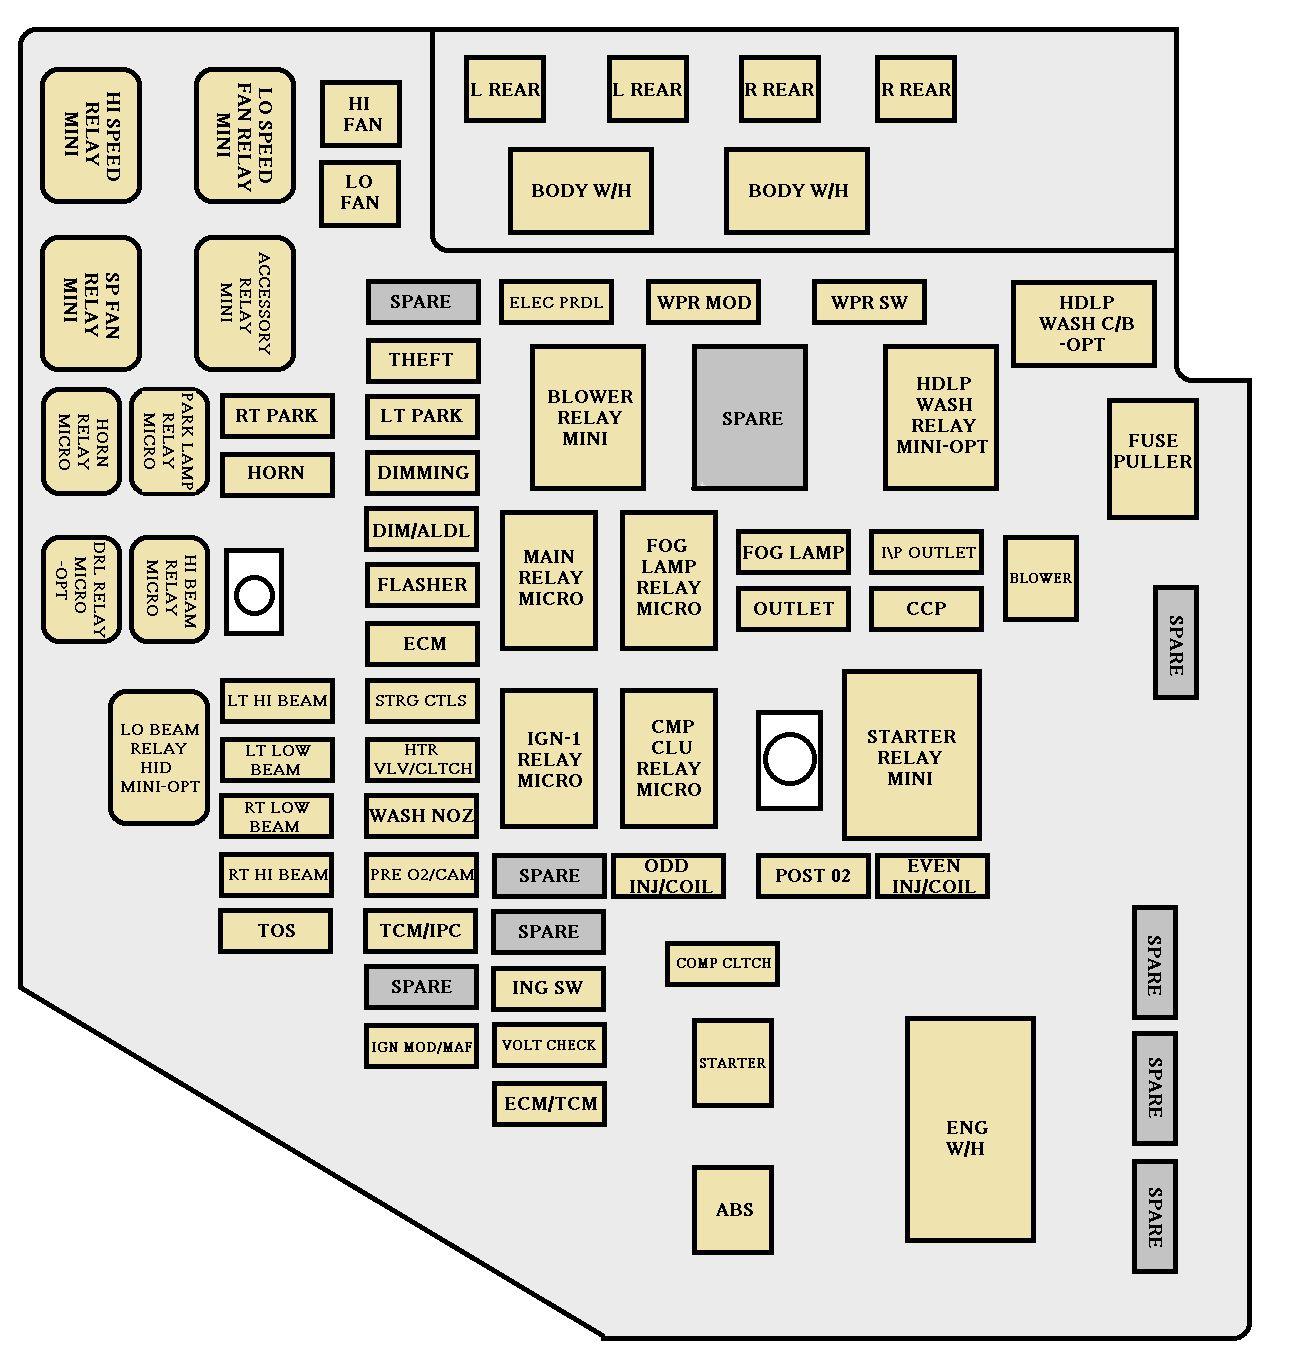 2006 gto fuse panel diagram wiring library 2006 jeep grand cherokee fuse box location cadillac cts rear fuse box online schematics diagram rh delvato co 2006 pontiac gto 2006 cadillac